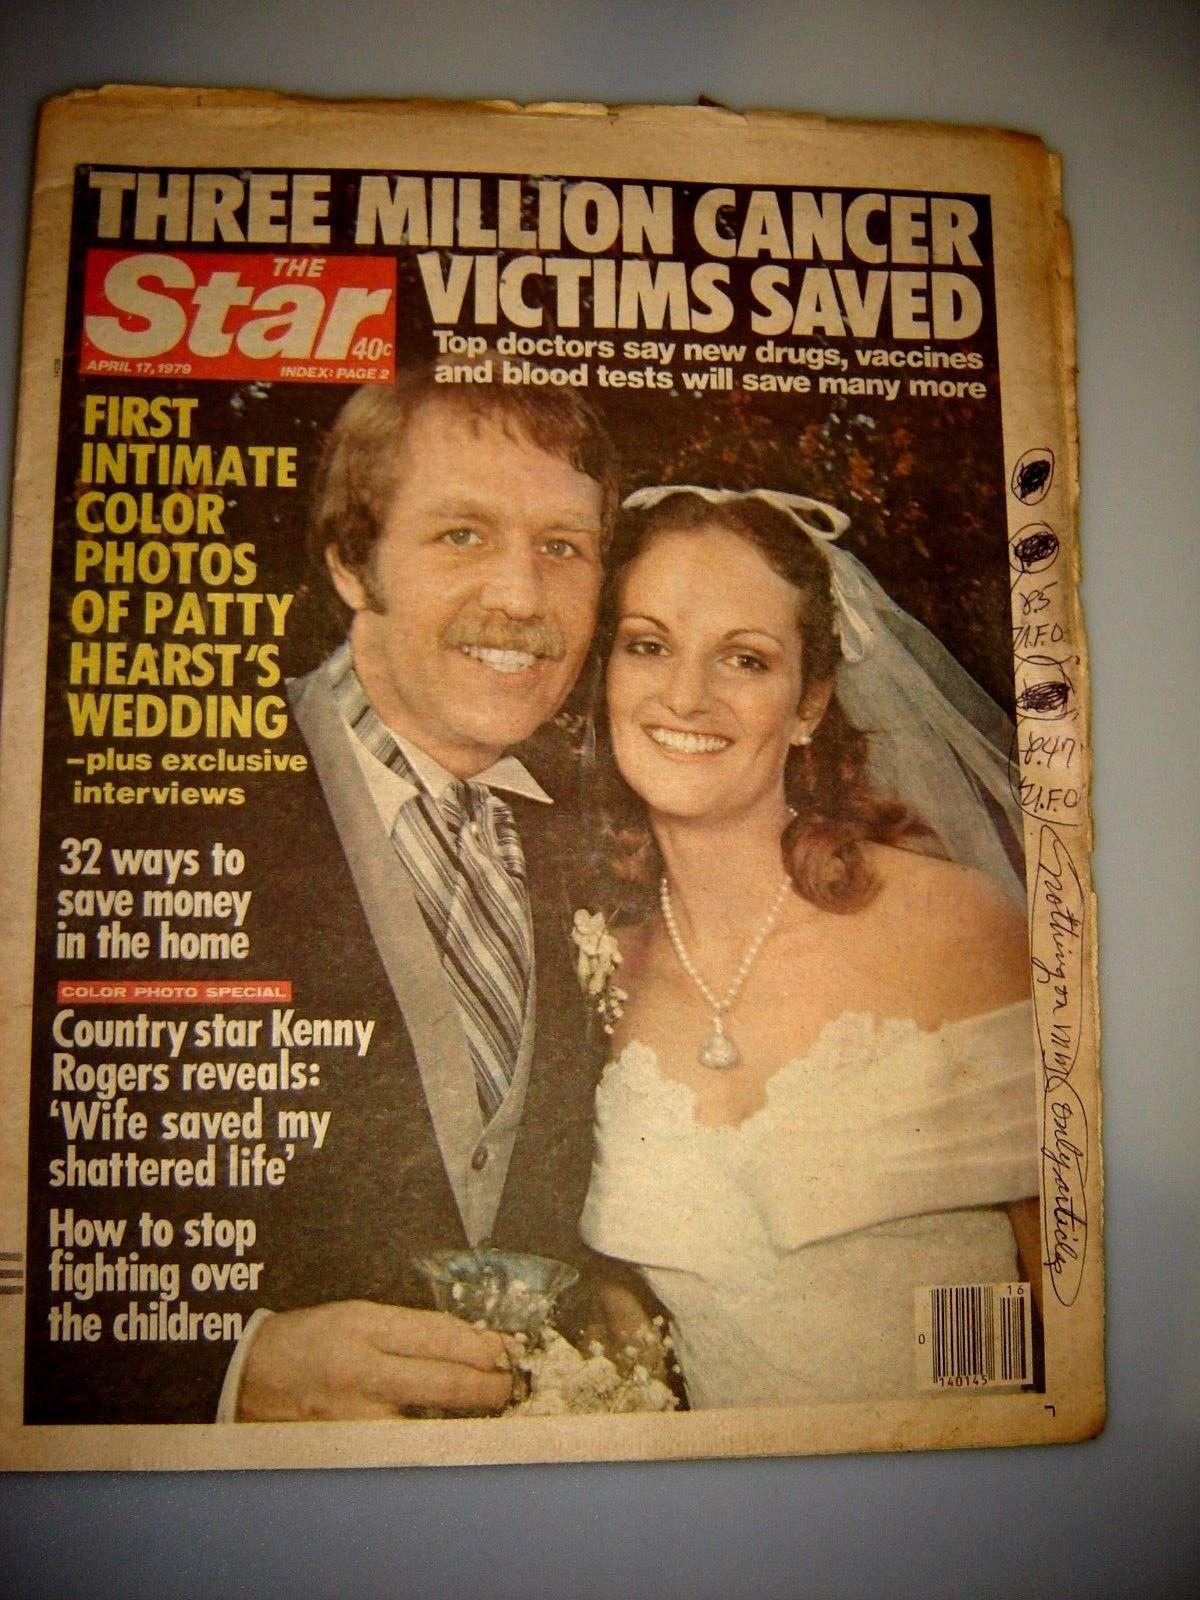 The star april patty hurst wedding ufo story kenny